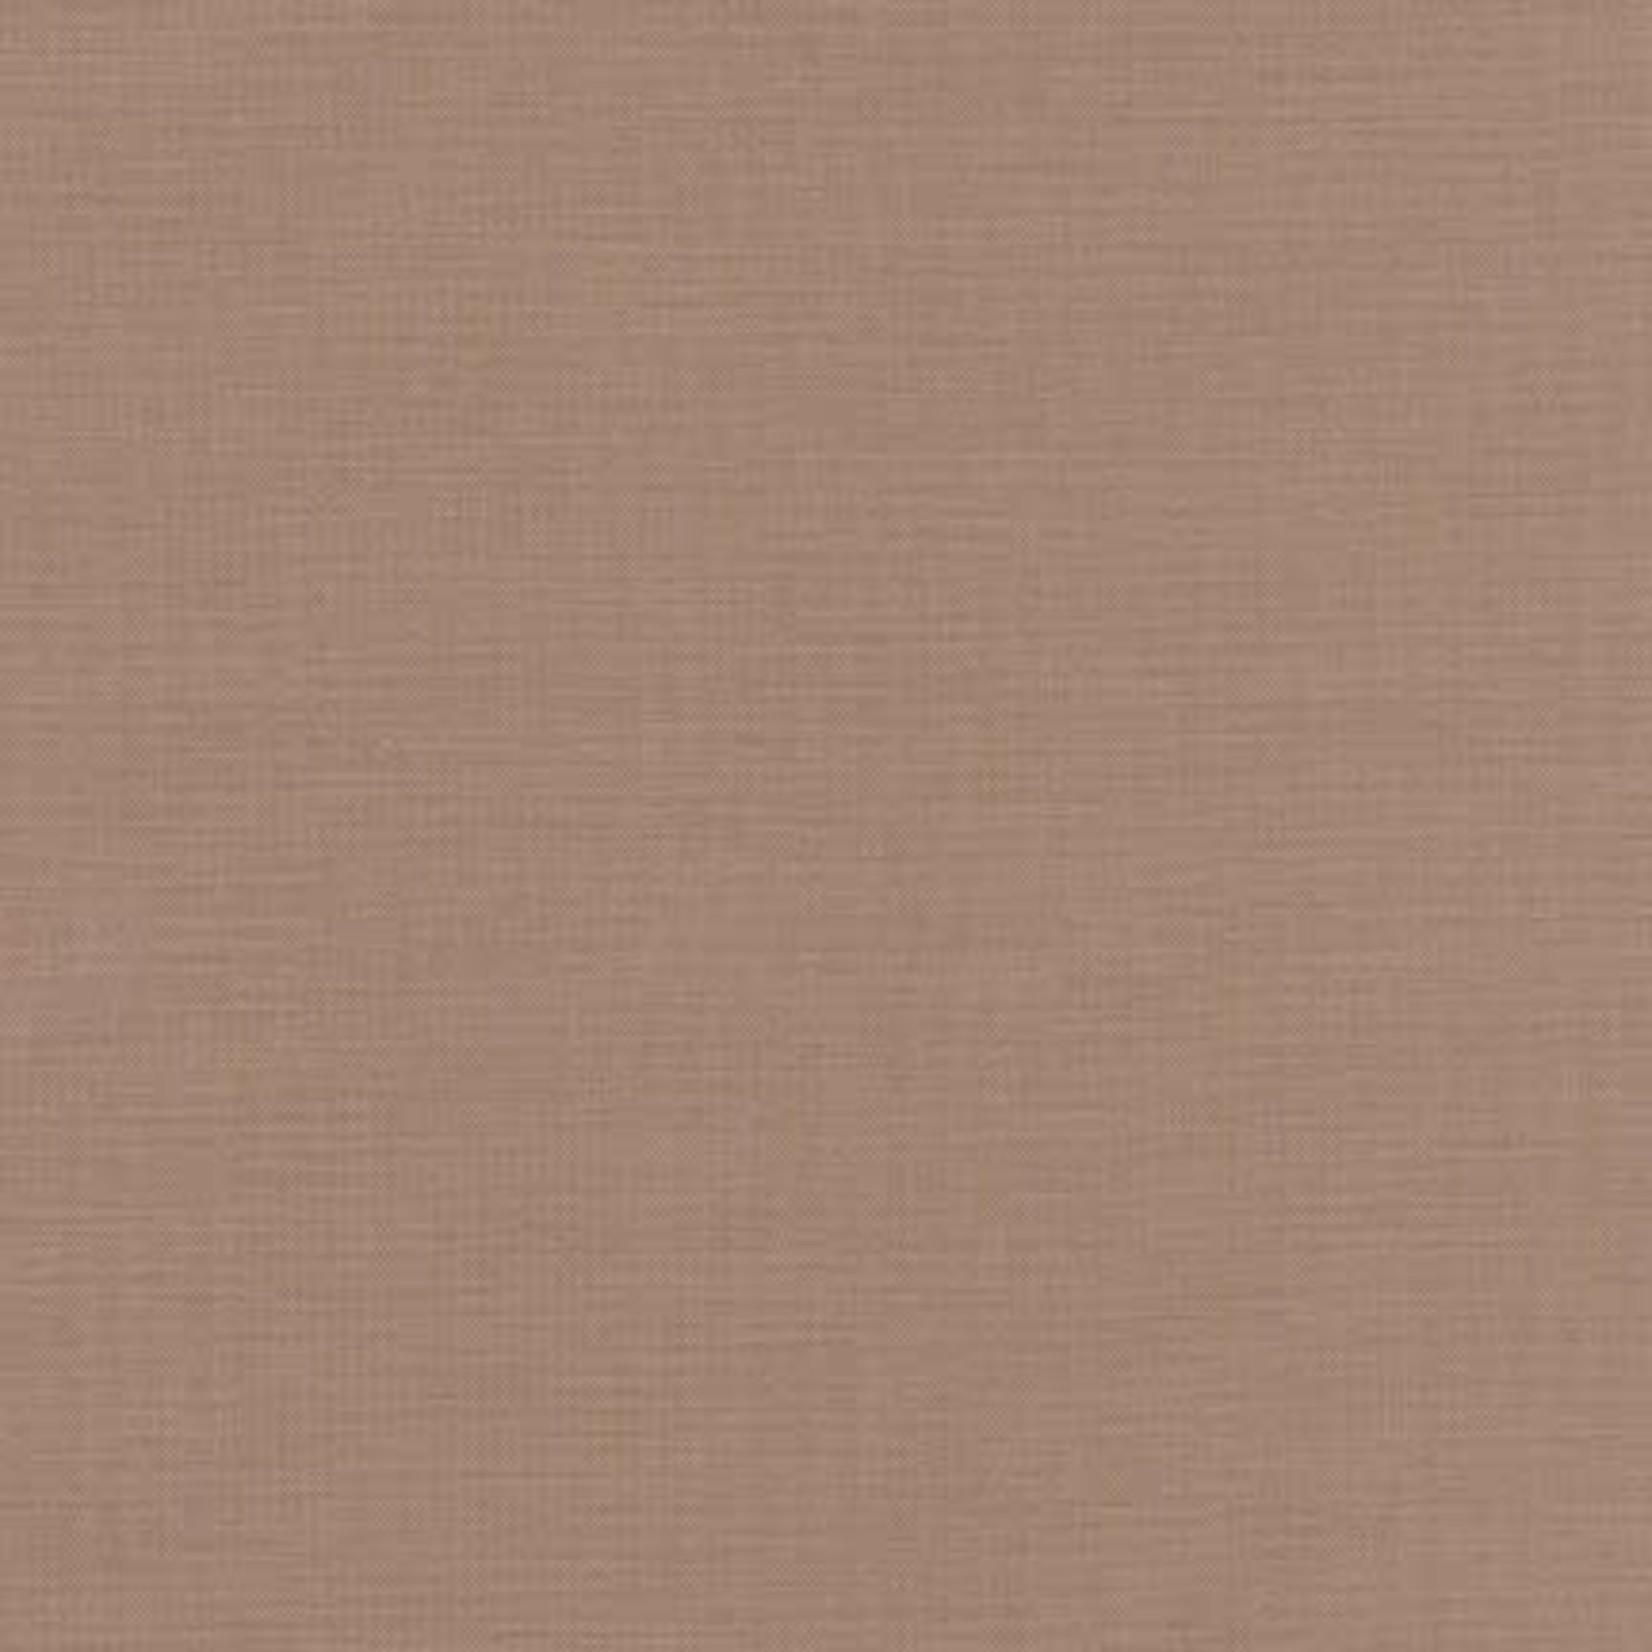 KONA KONA  K001-1855 SUEDE, PER CM OR $14/M